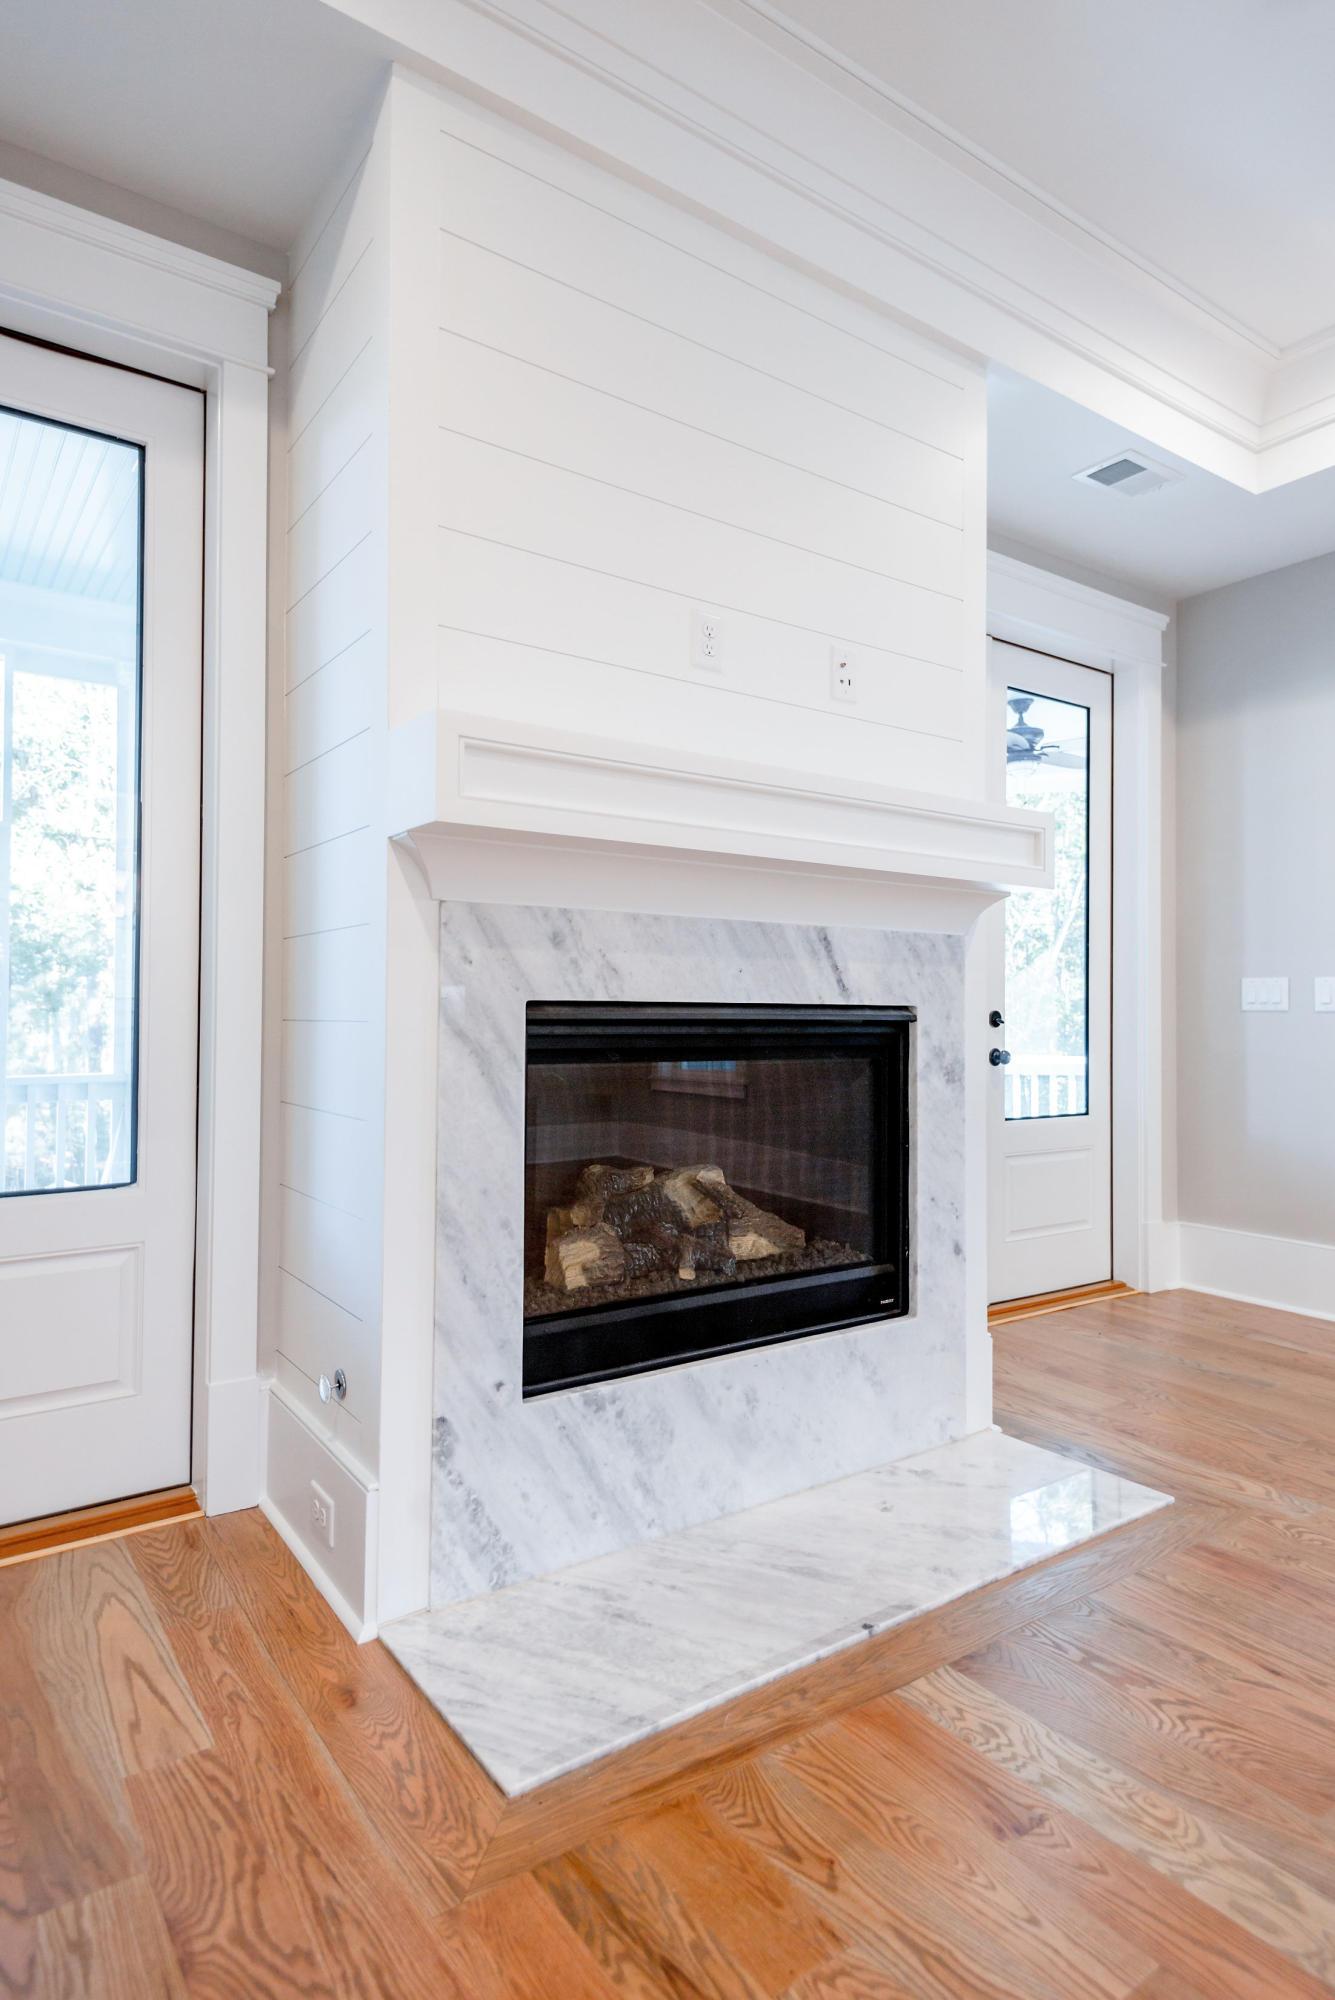 Park West Homes For Sale - 2295 Middlesex, Mount Pleasant, SC - 49